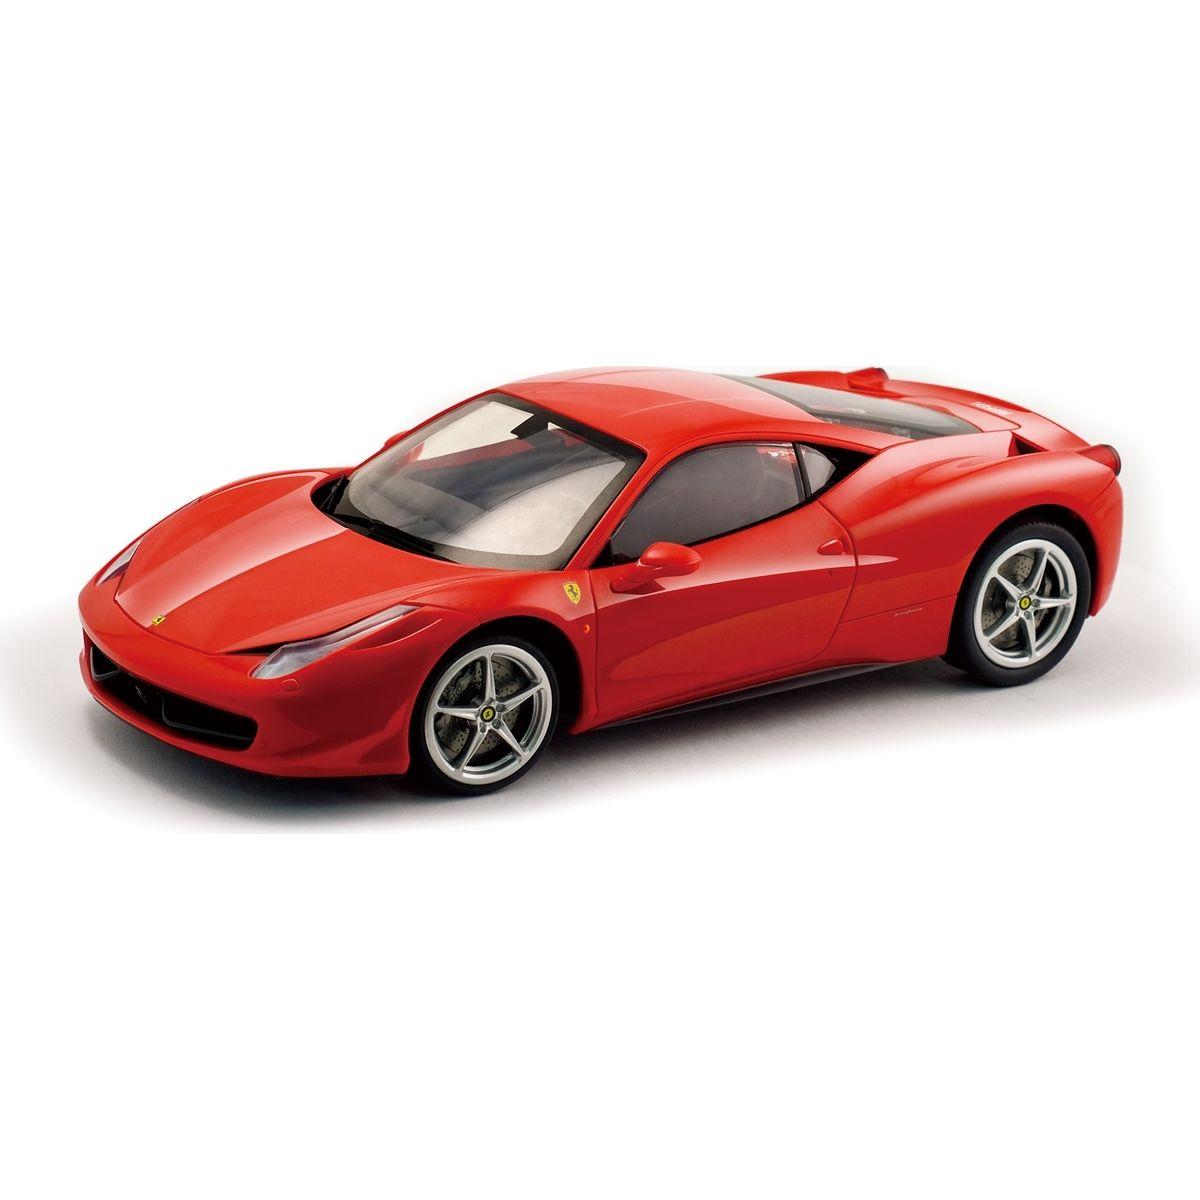 Silverlit RC auto Ferrari 458 Italia Android Silverlit